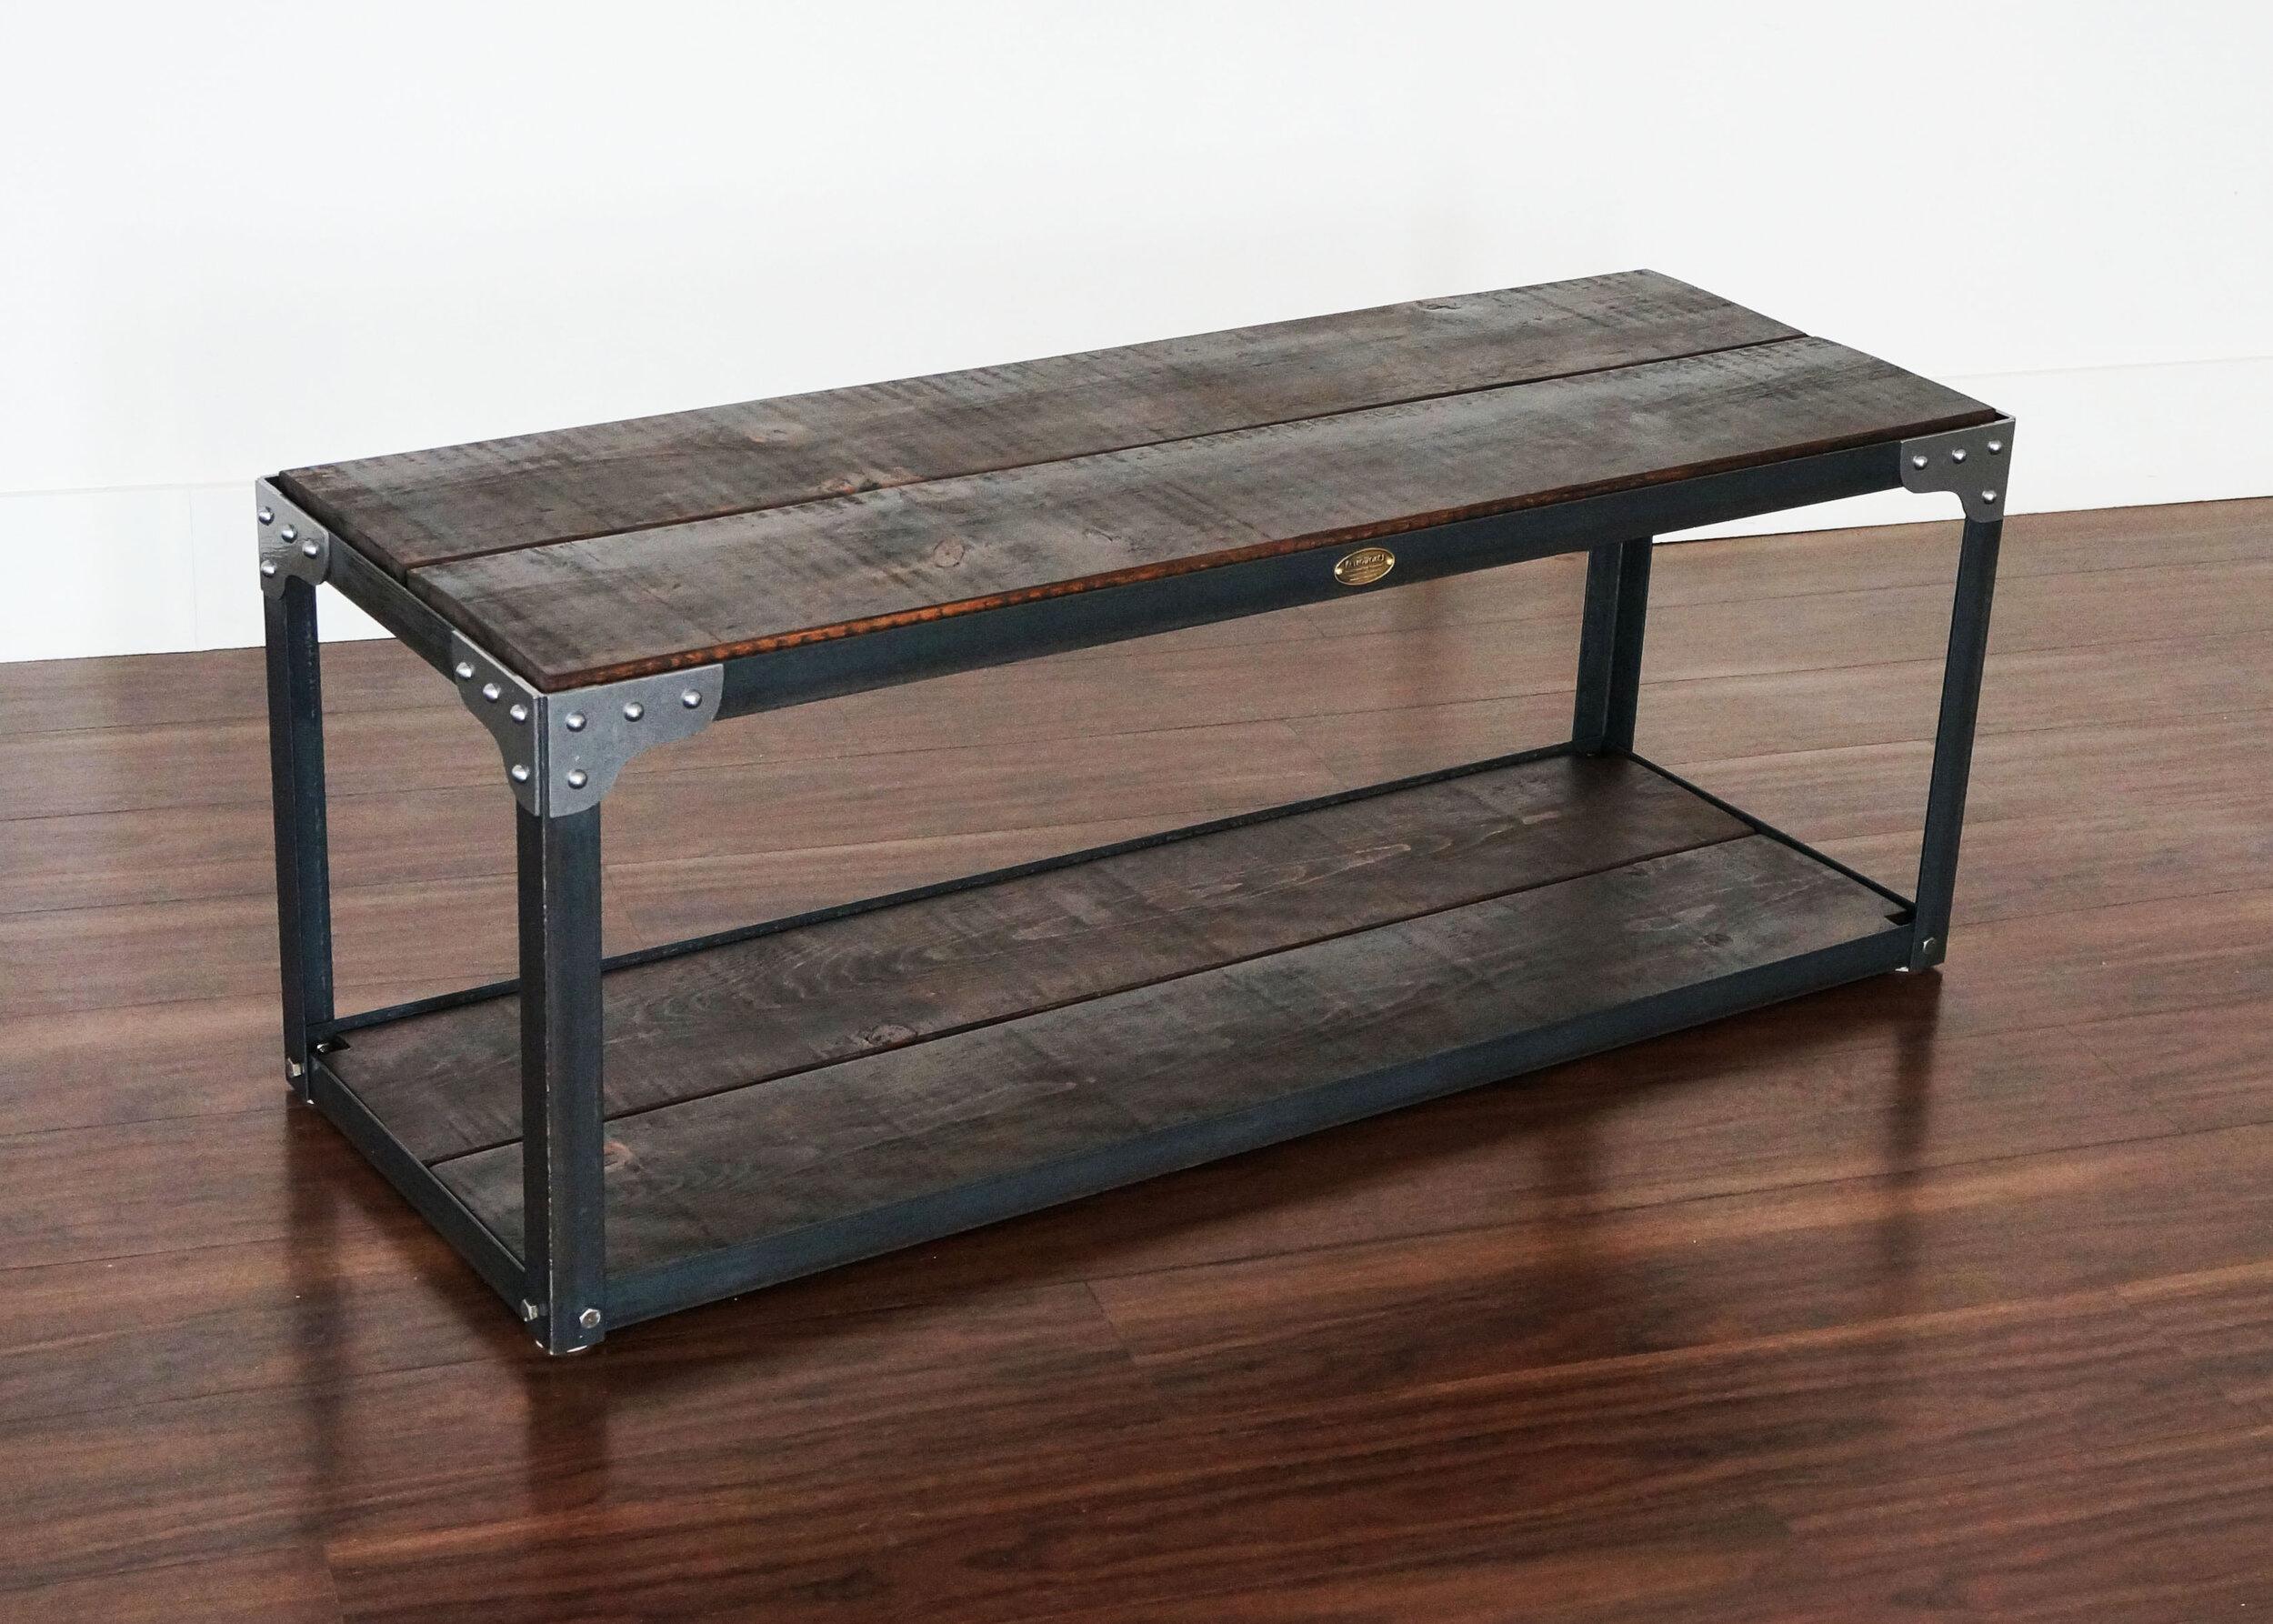 industrial style bench.jpg